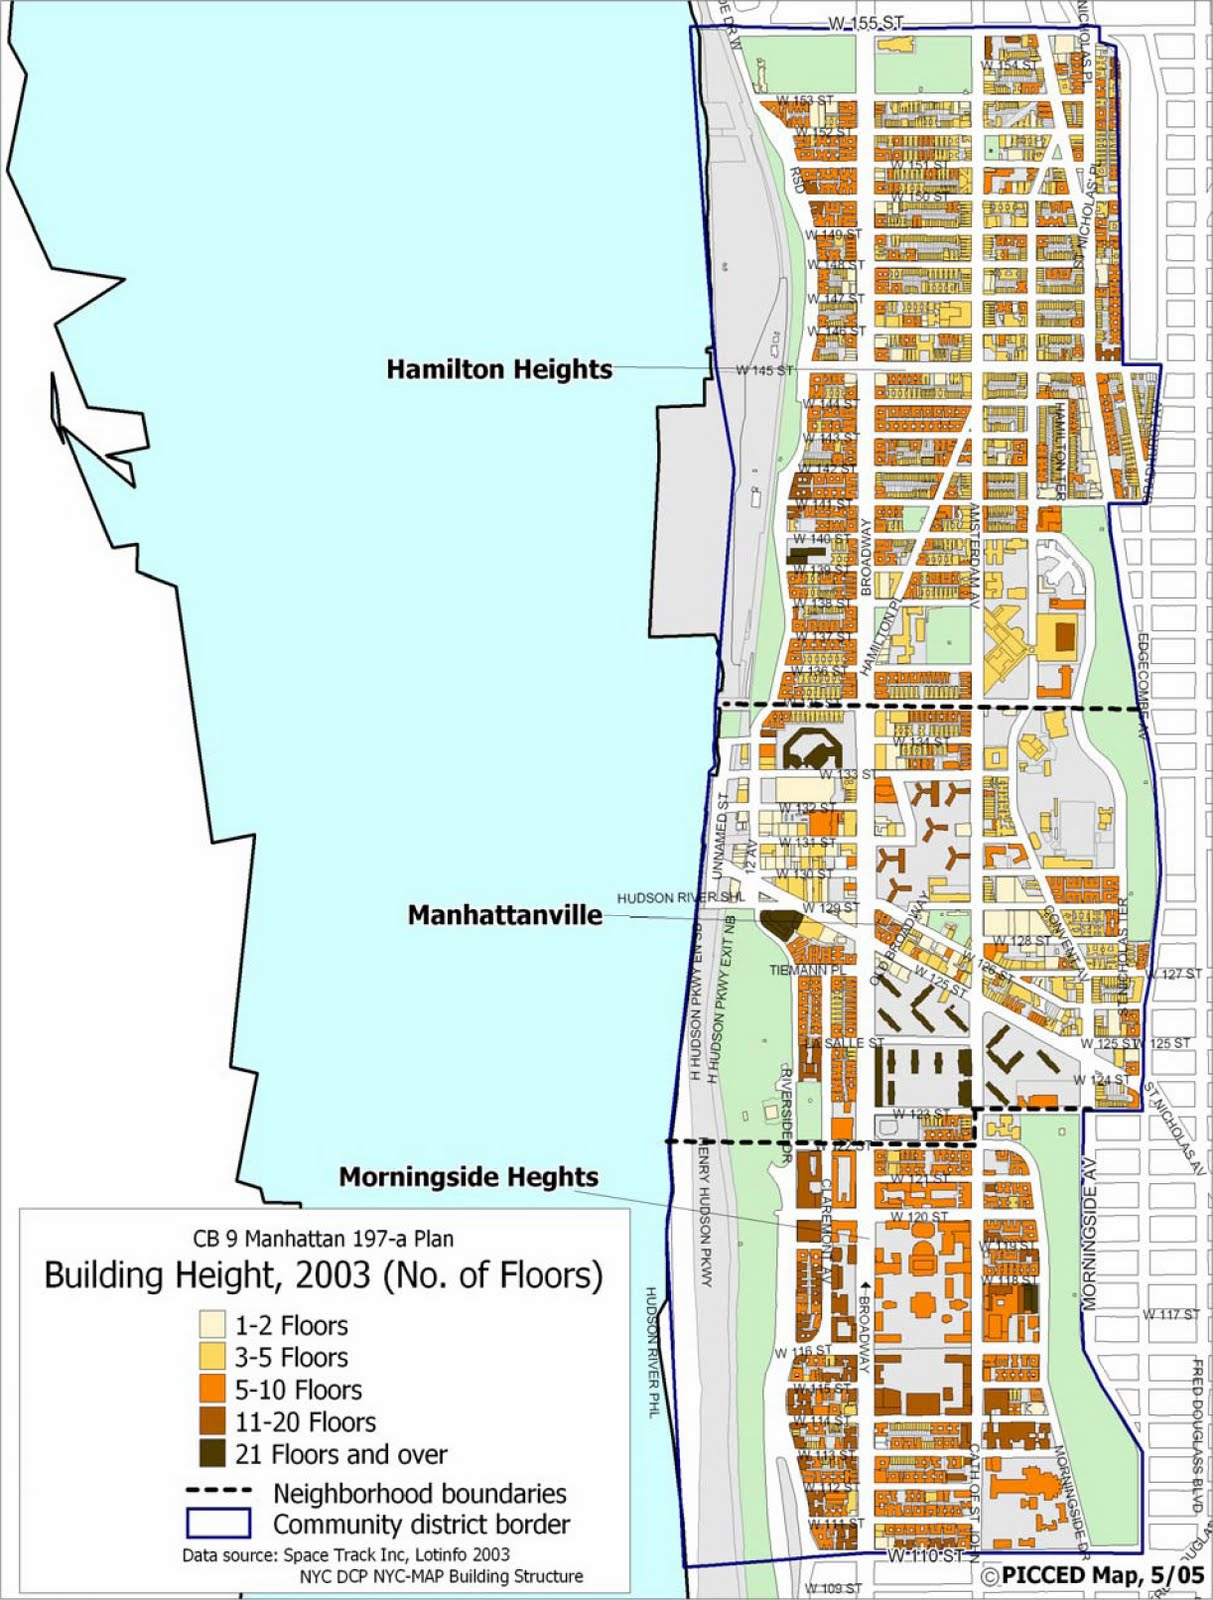 Harlem Nyc Map.H A R L E M B E S P O K E Neighborhood Maps